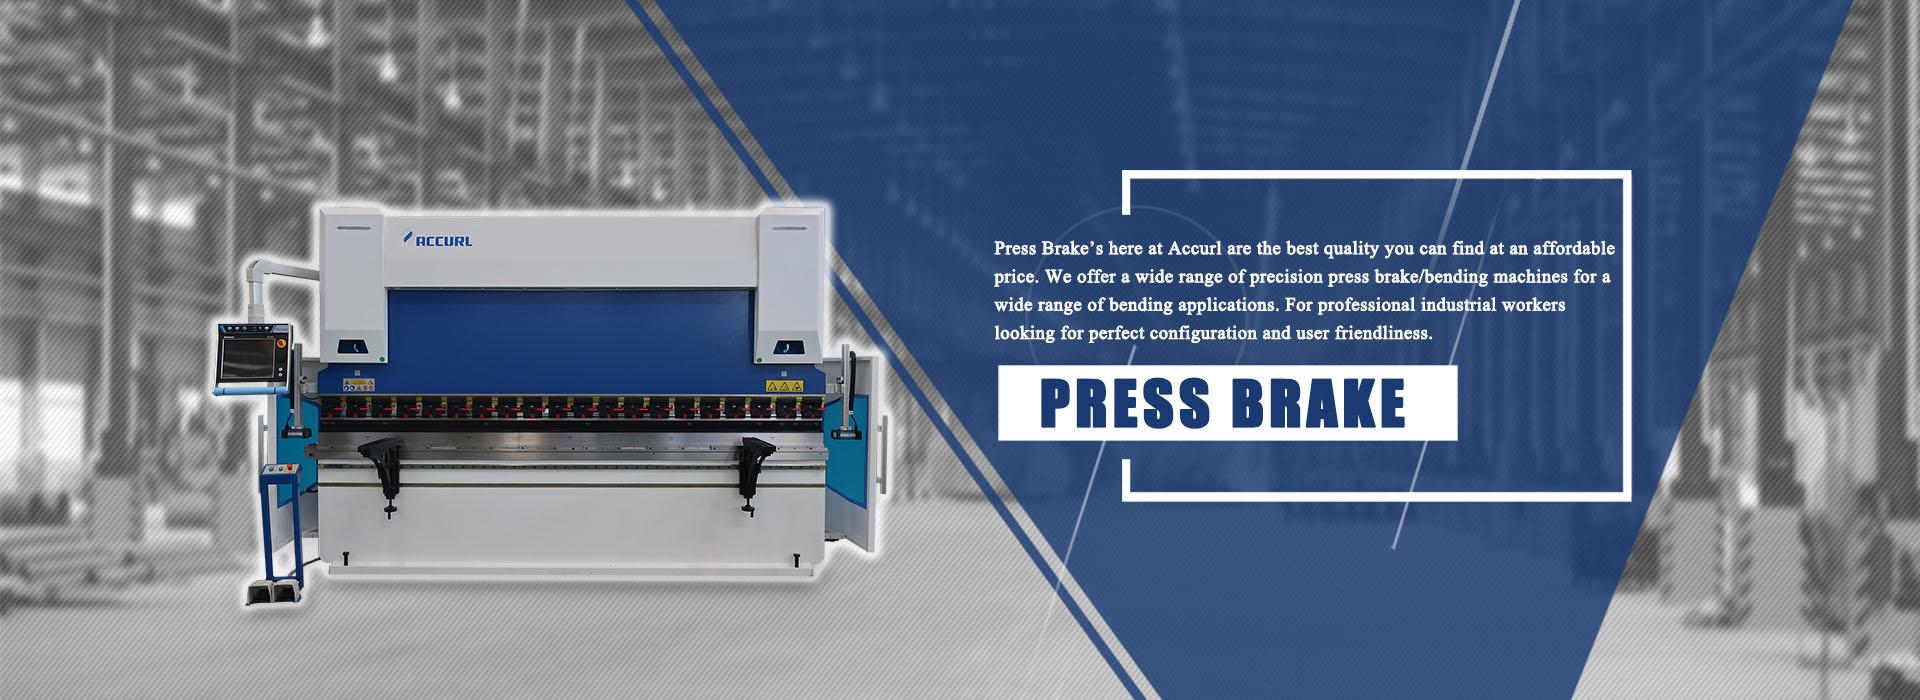 Press Brake Banner